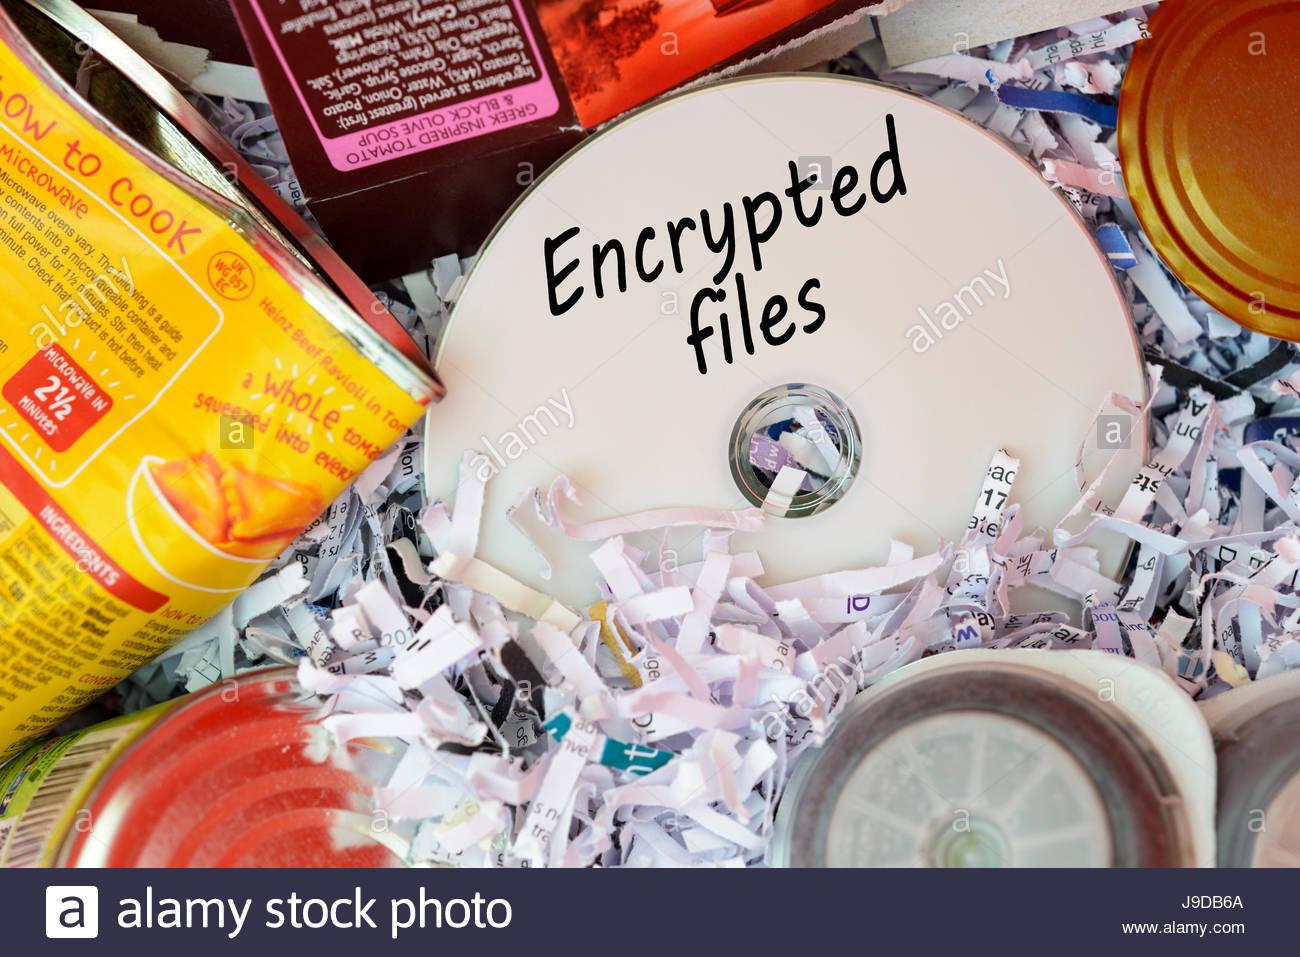 Encrypted files, data disc thrown in Bin, Dorset, England. - Stock Image